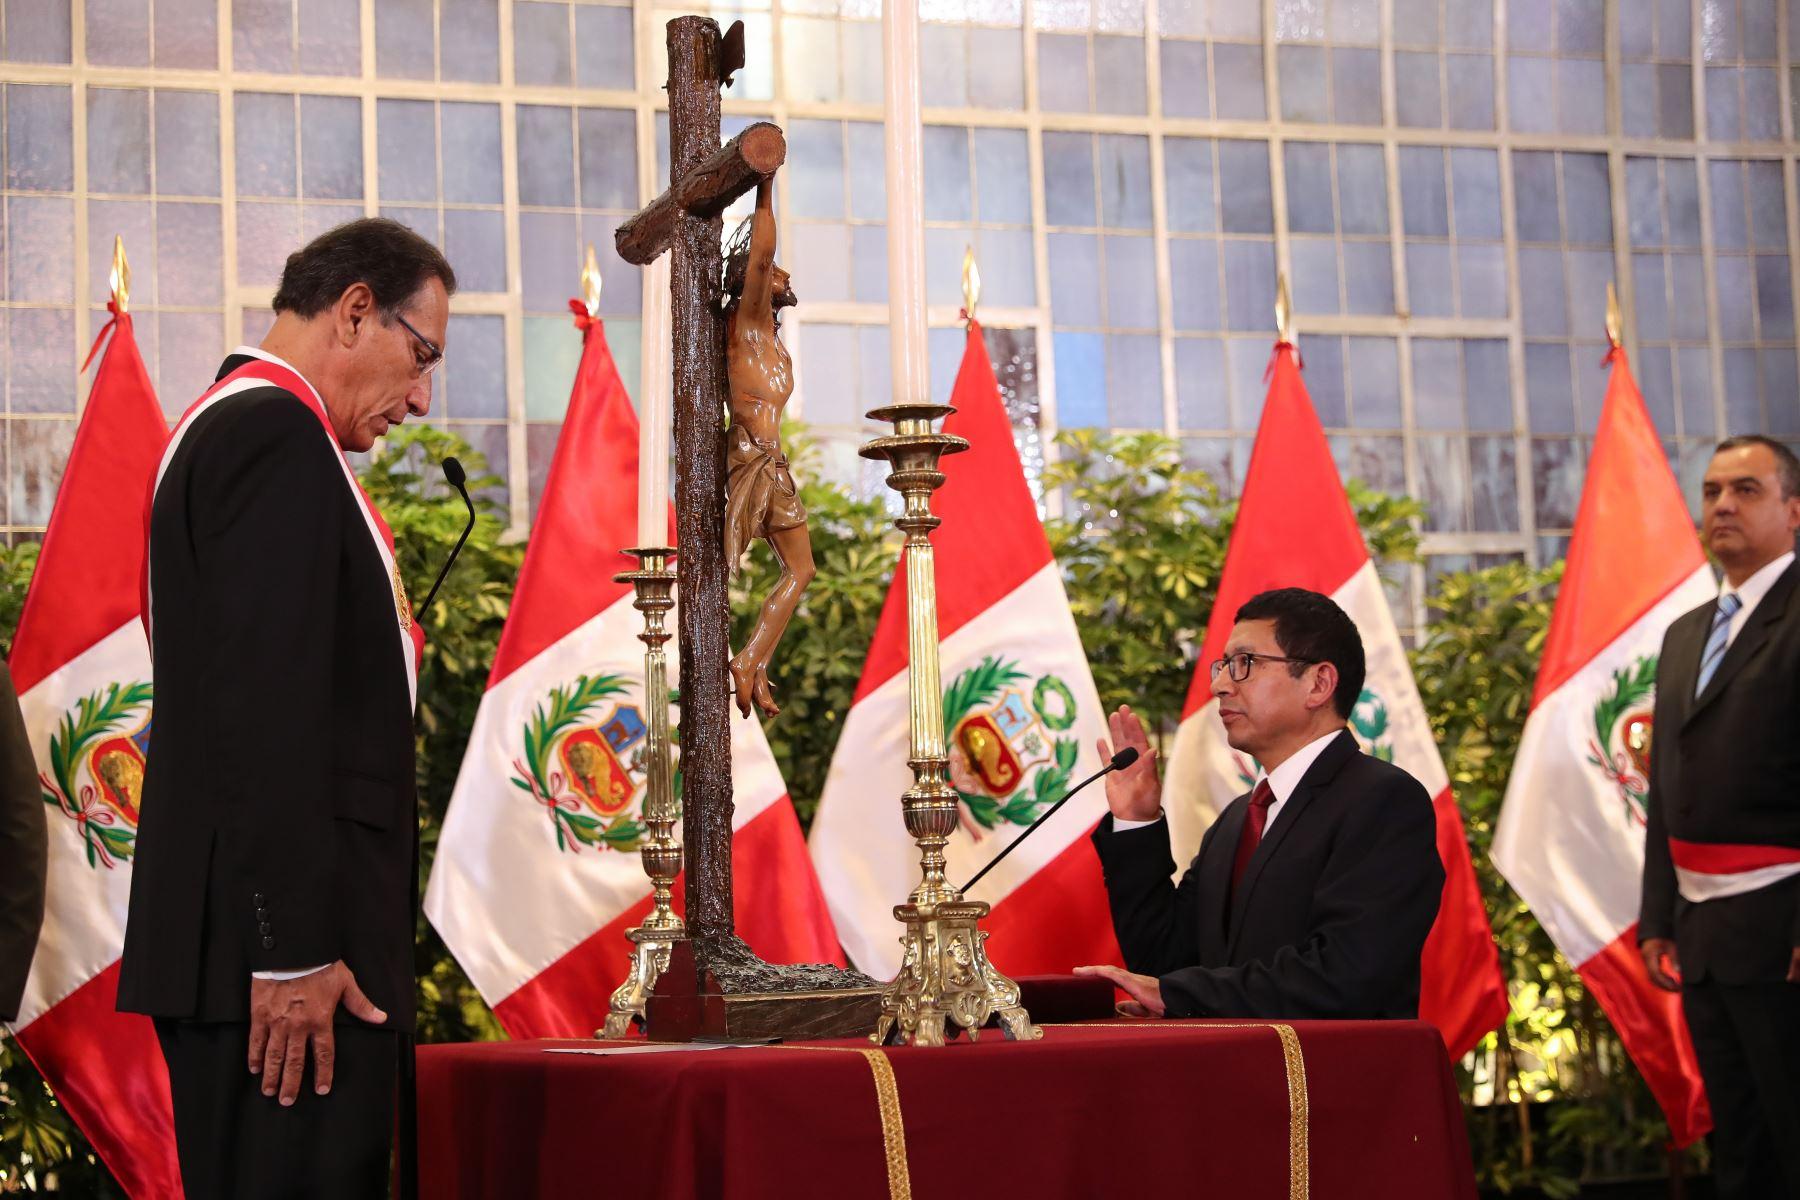 Edmer Trujillo juramenta como ministro de Transportes y Comunicaciones. Foto: ANDINA/Prensa Presidencia